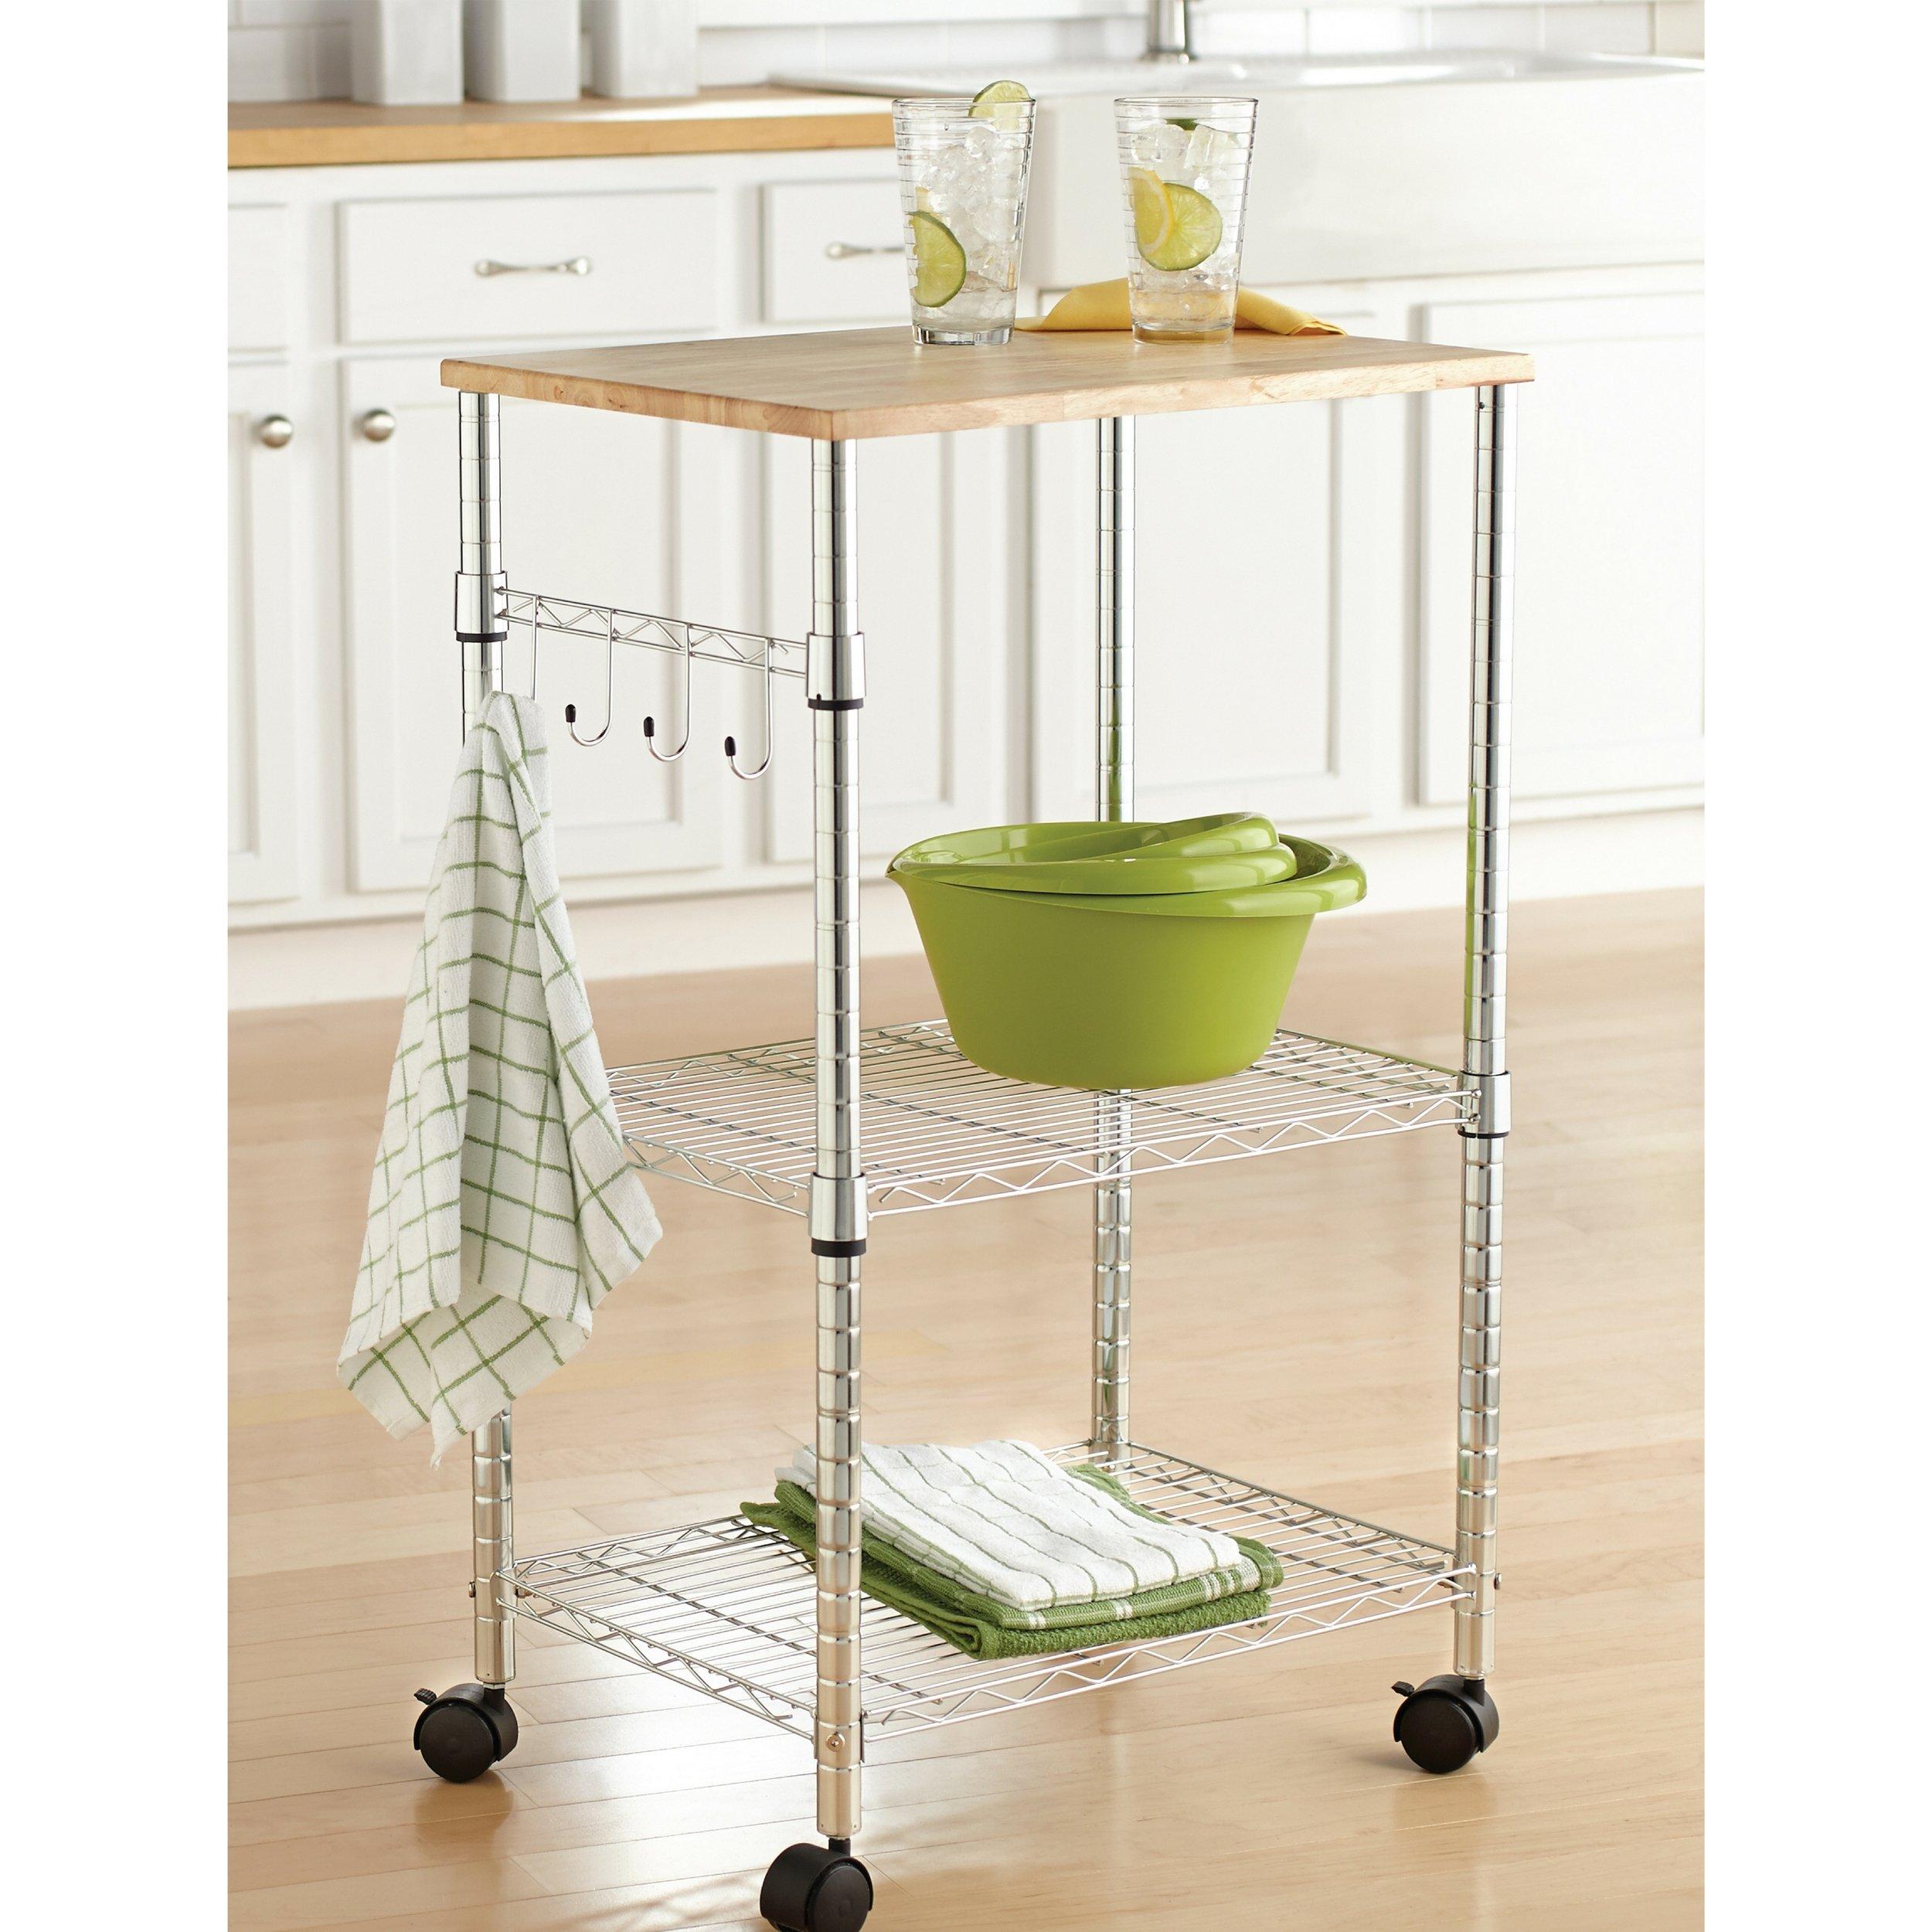 Mainstays Cart Sturdy Metal Sleek Design Wood Top Multi-Purpose Kitchen Cart, Chrome